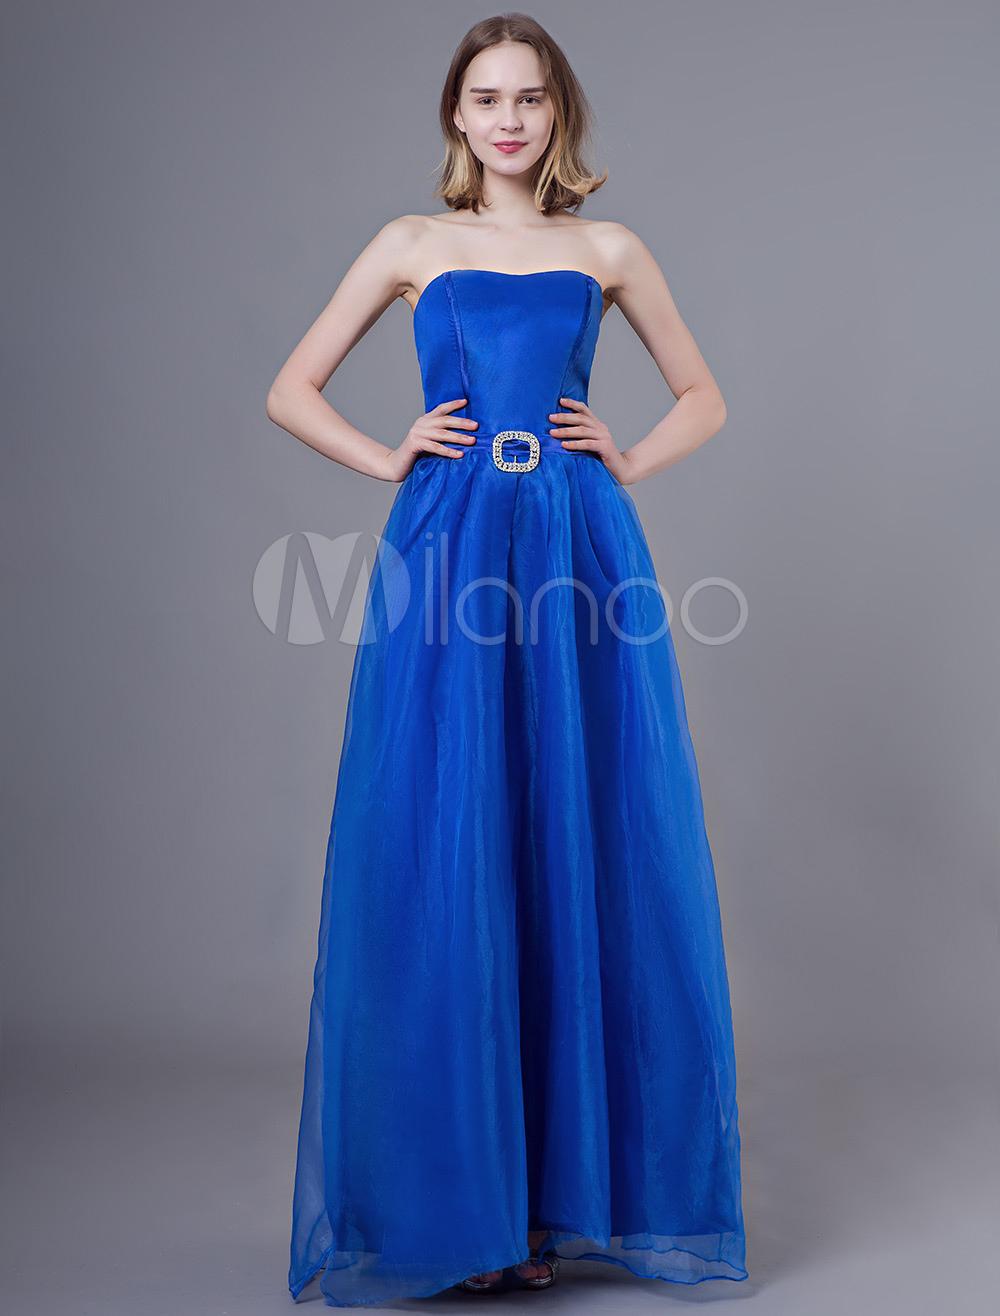 huge selection of af348 876d0 Abito da cerimonia lungo formale in organza blu royal senza bretelle